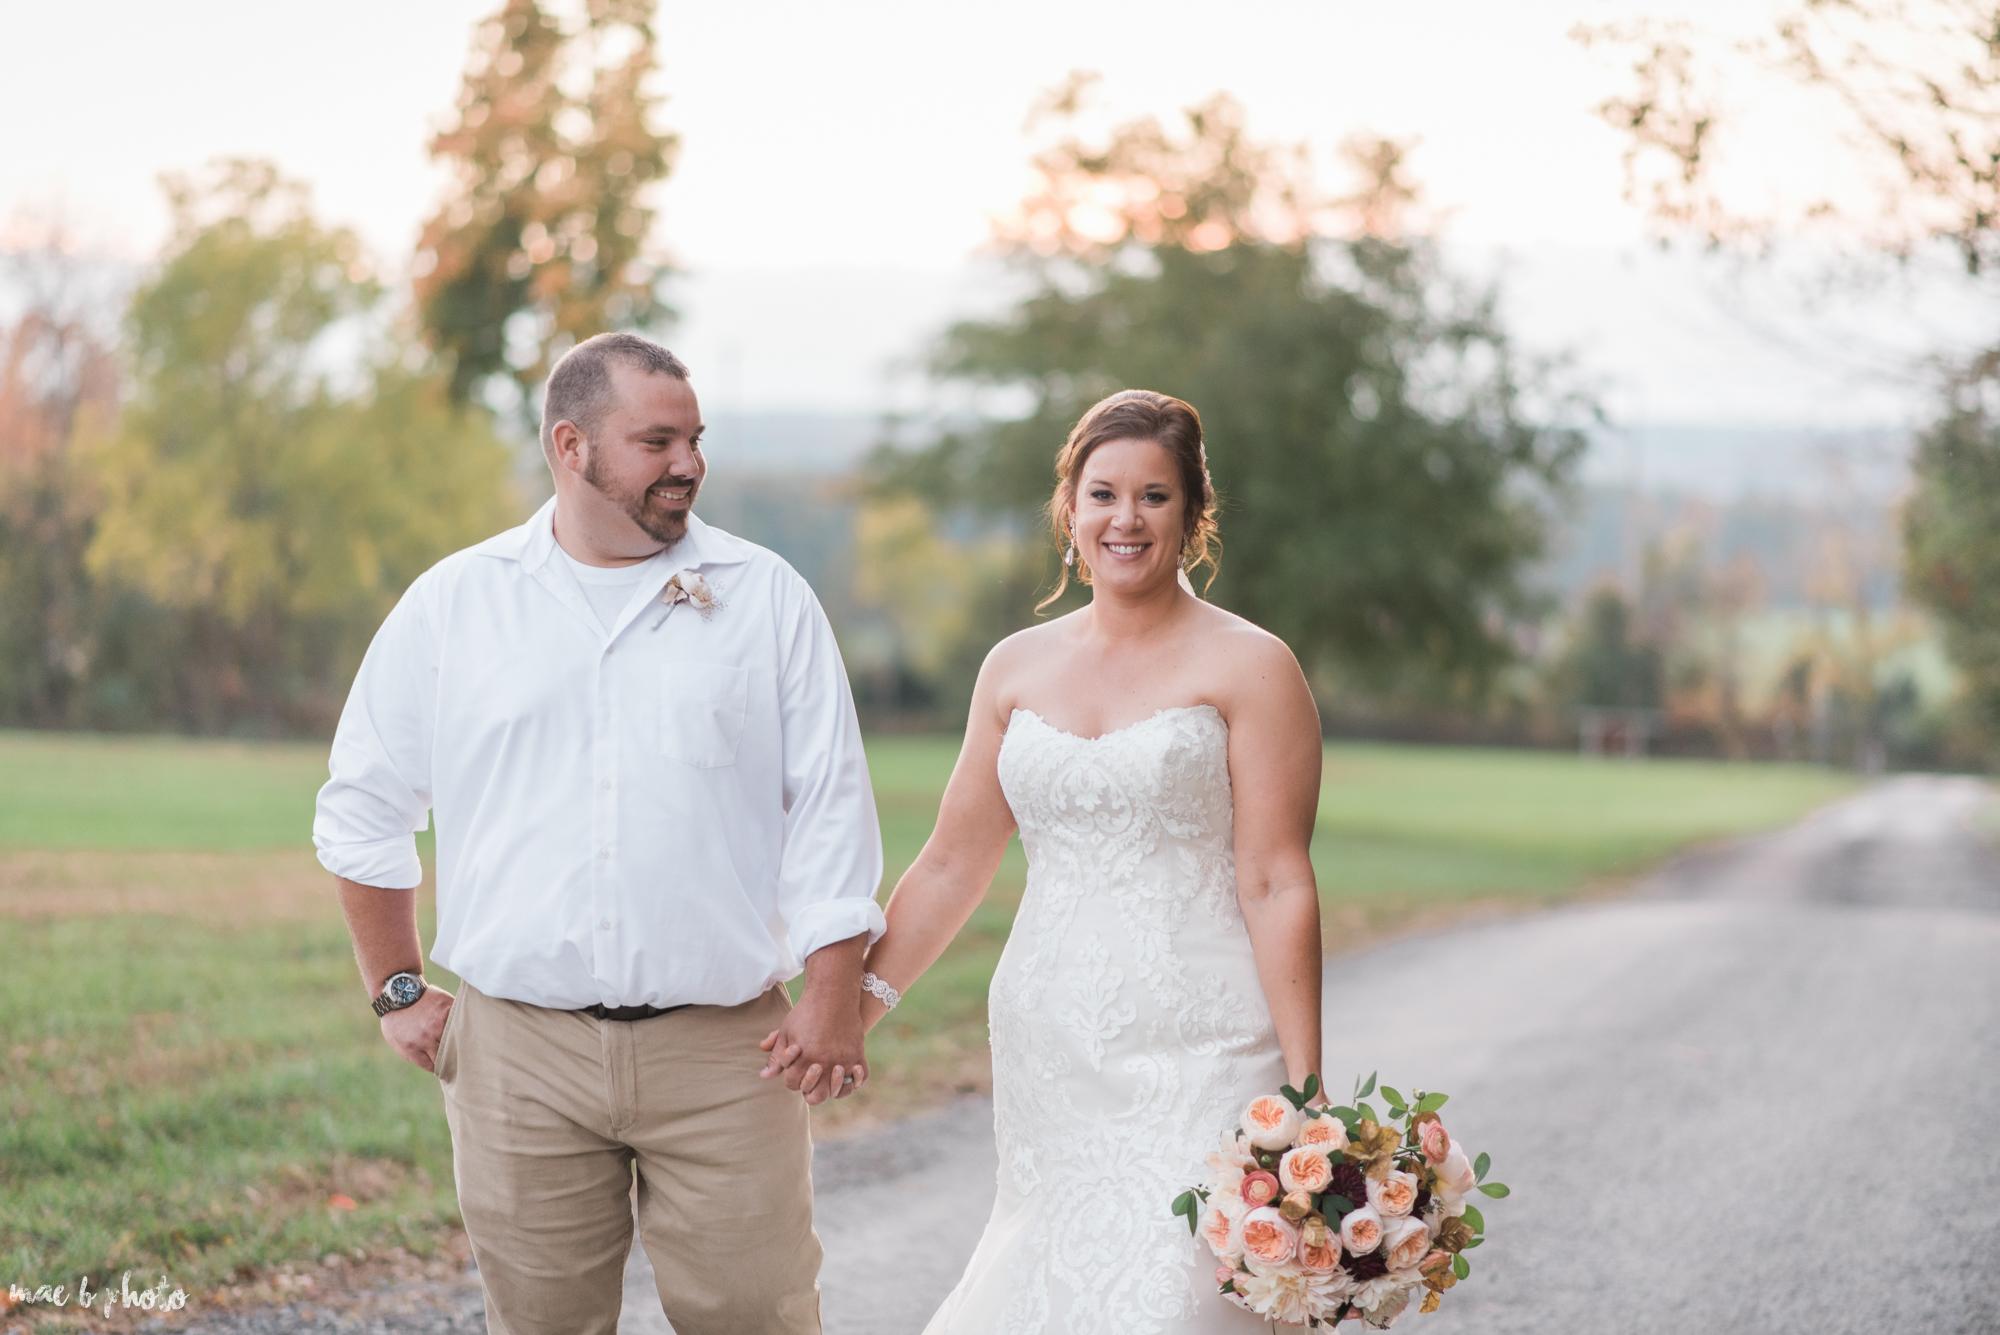 Sarah & Dustin's Rustic Chic Barn Wedding at Hartford Hill Winery in Hartford, Ohio by Mae B Photo-91.jpg